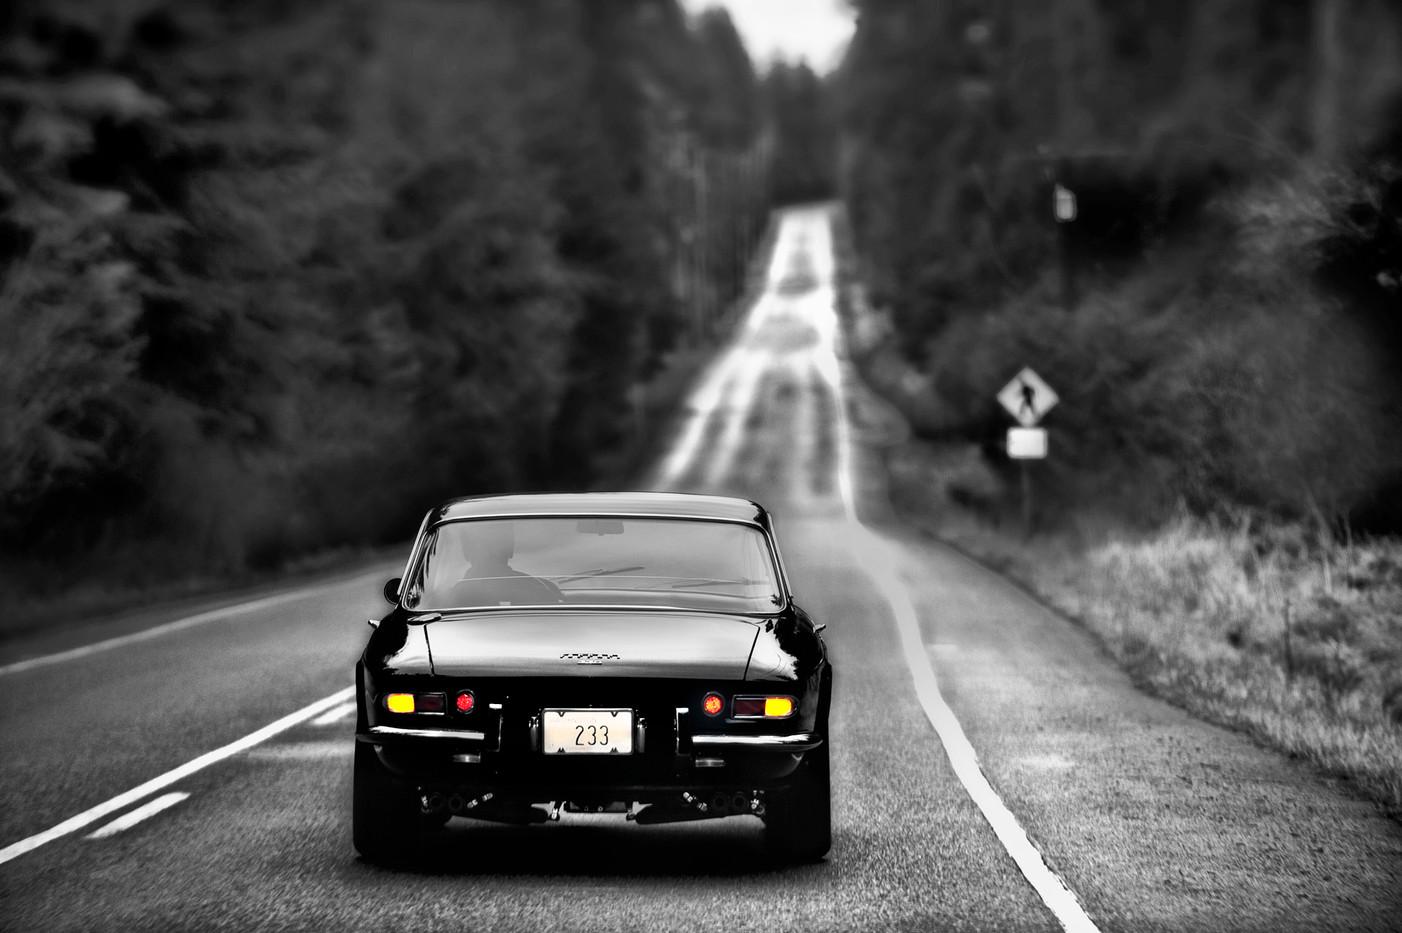 morgan_vintage cars_photography 5.jpg